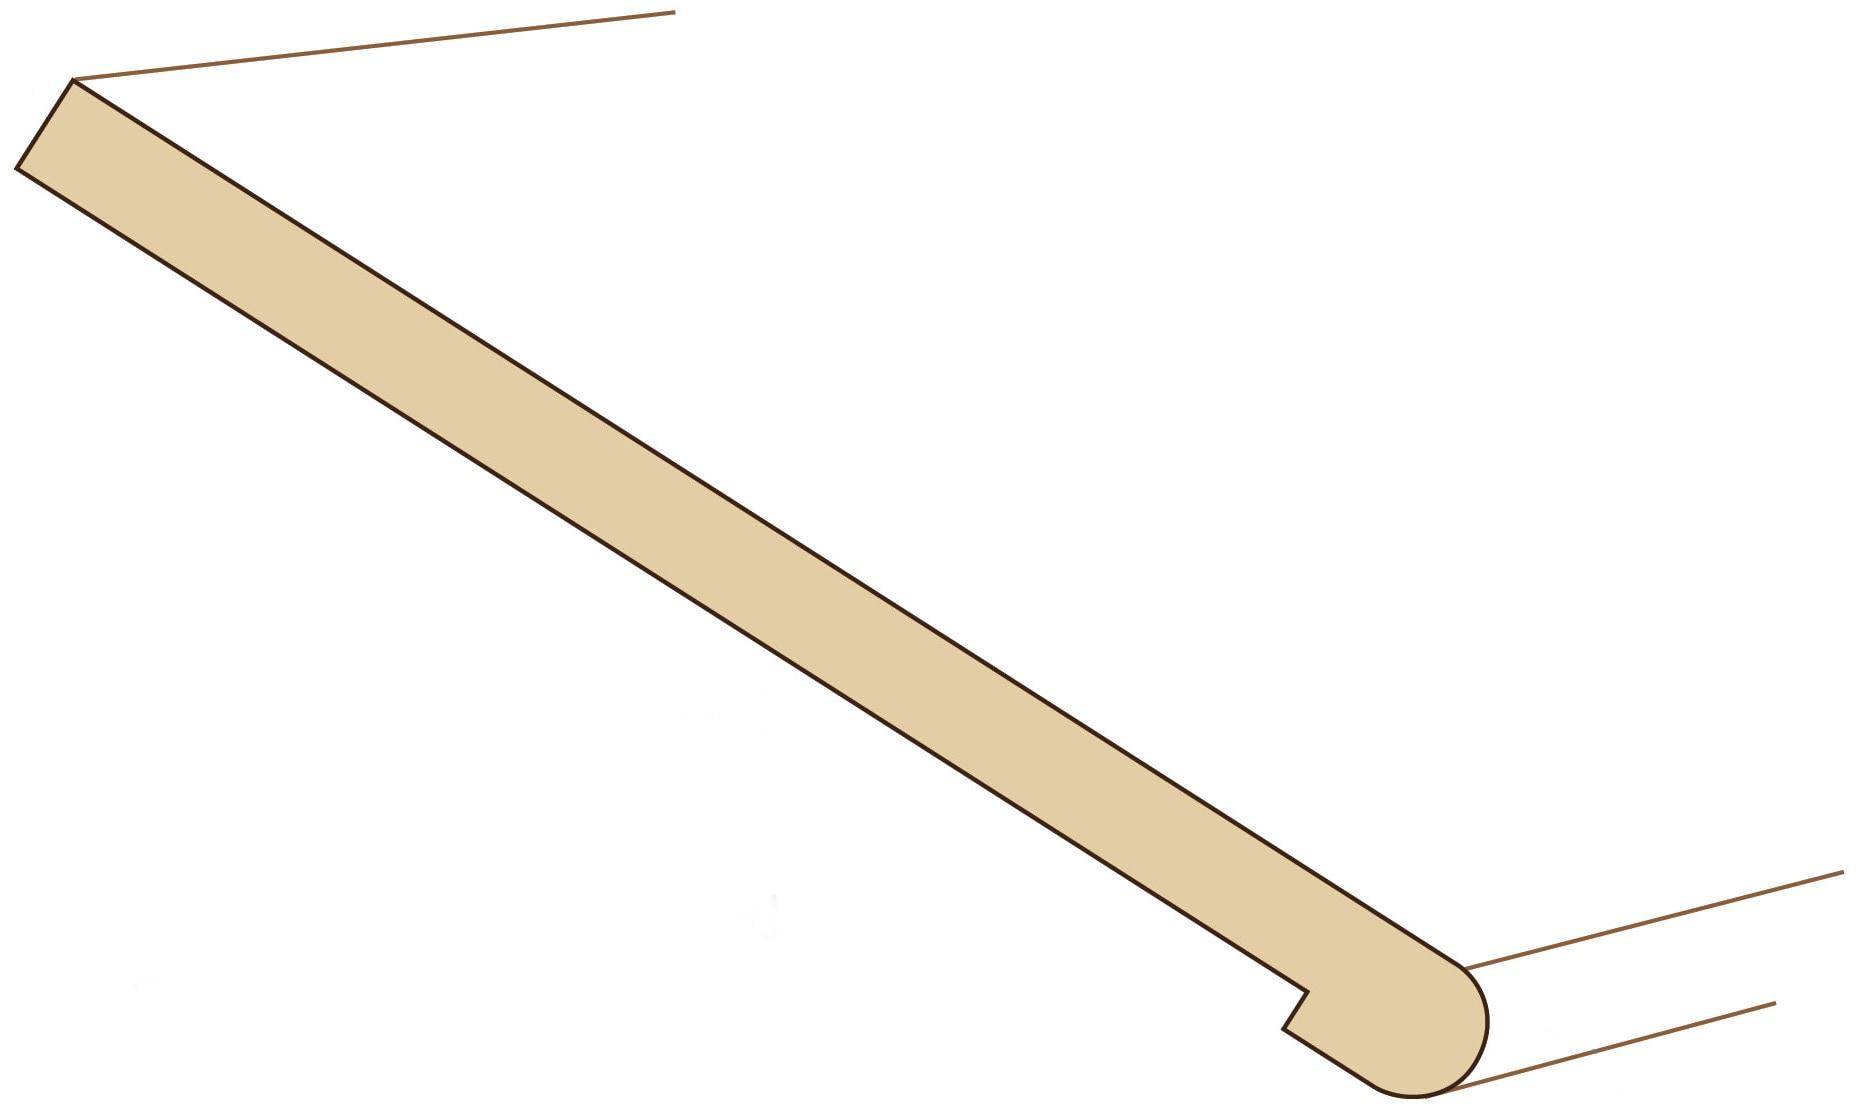 "Pine / Stair Tread / 48"" x 11 1/2"" x 3/4"" / Semi-Gloss Pine Treads - Collection 0"